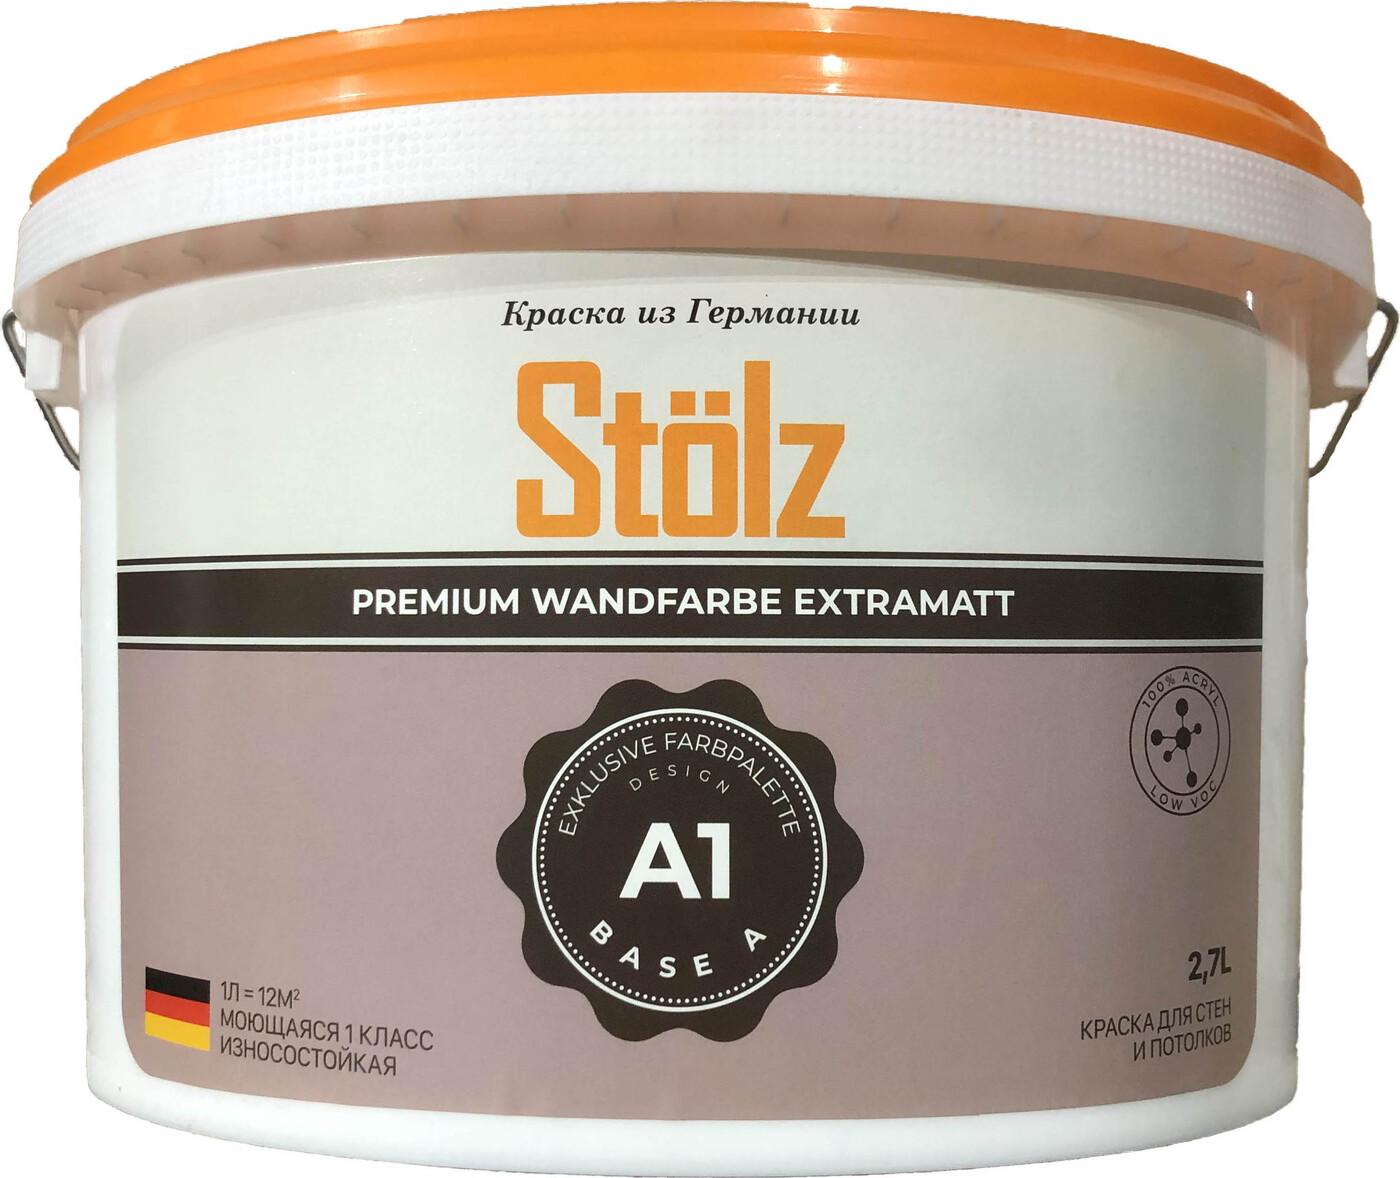 Краска Stolz A1 Base А 2,7л